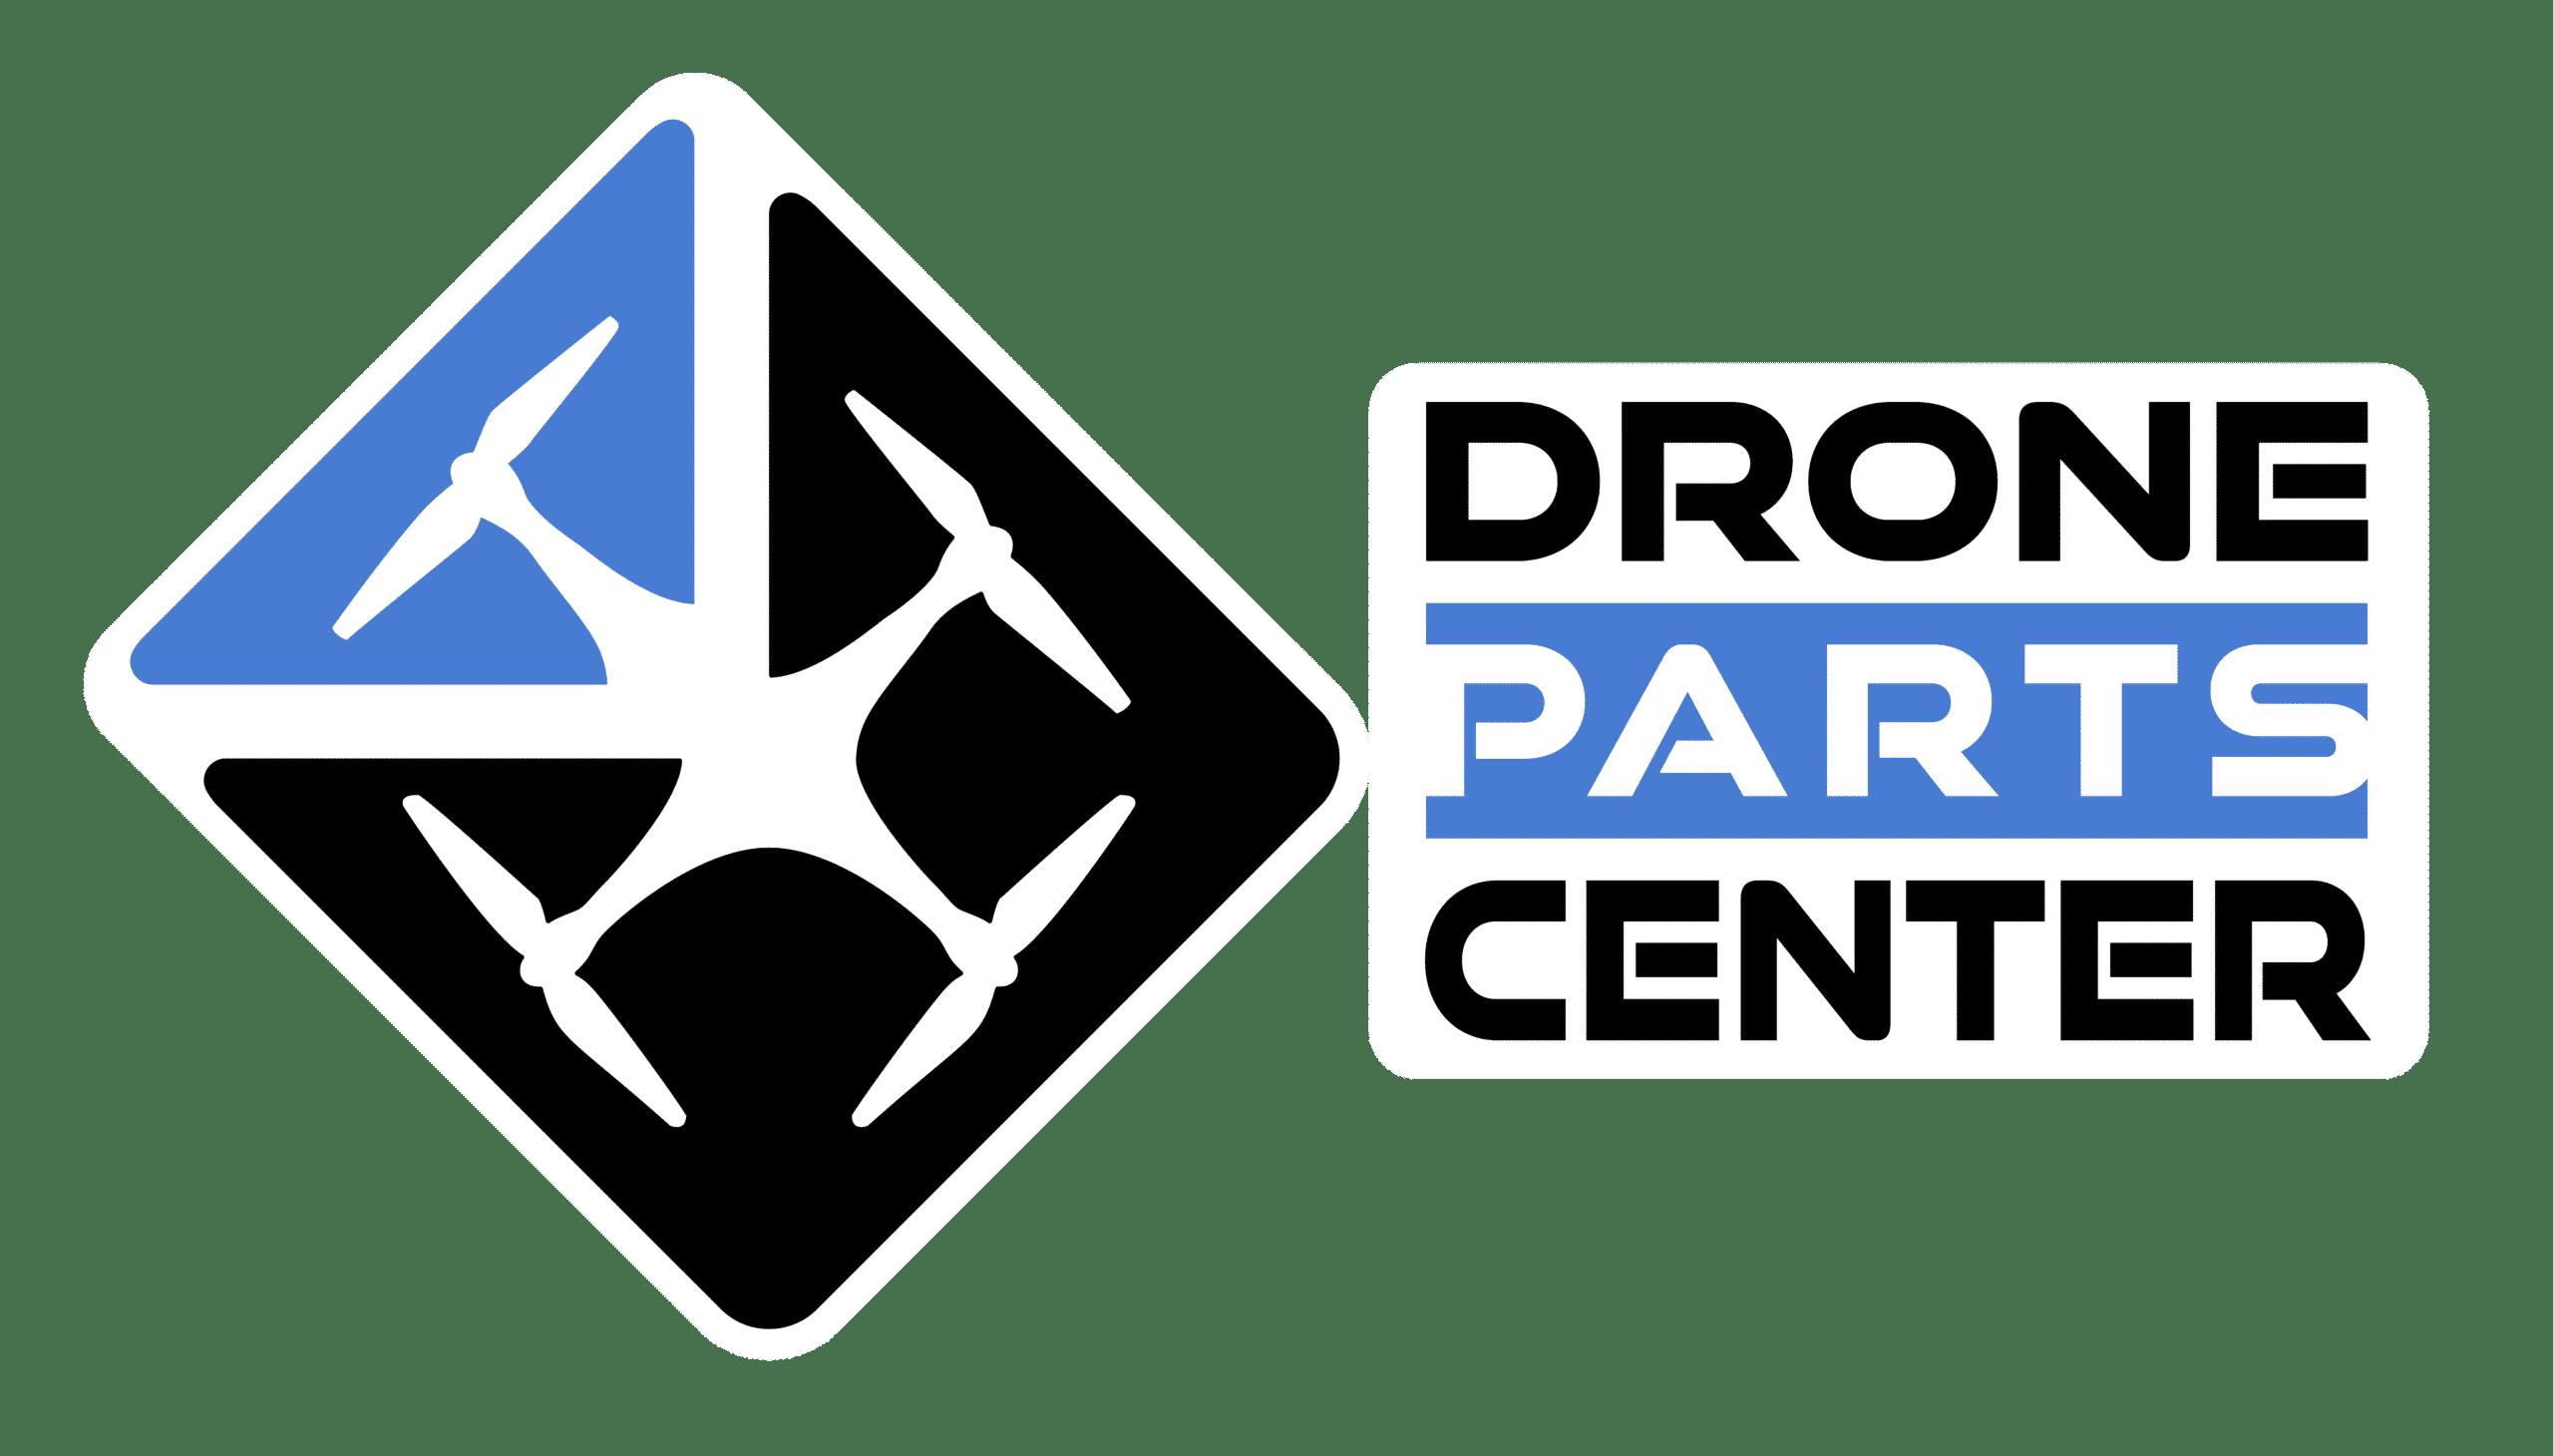 Drone Parts Center